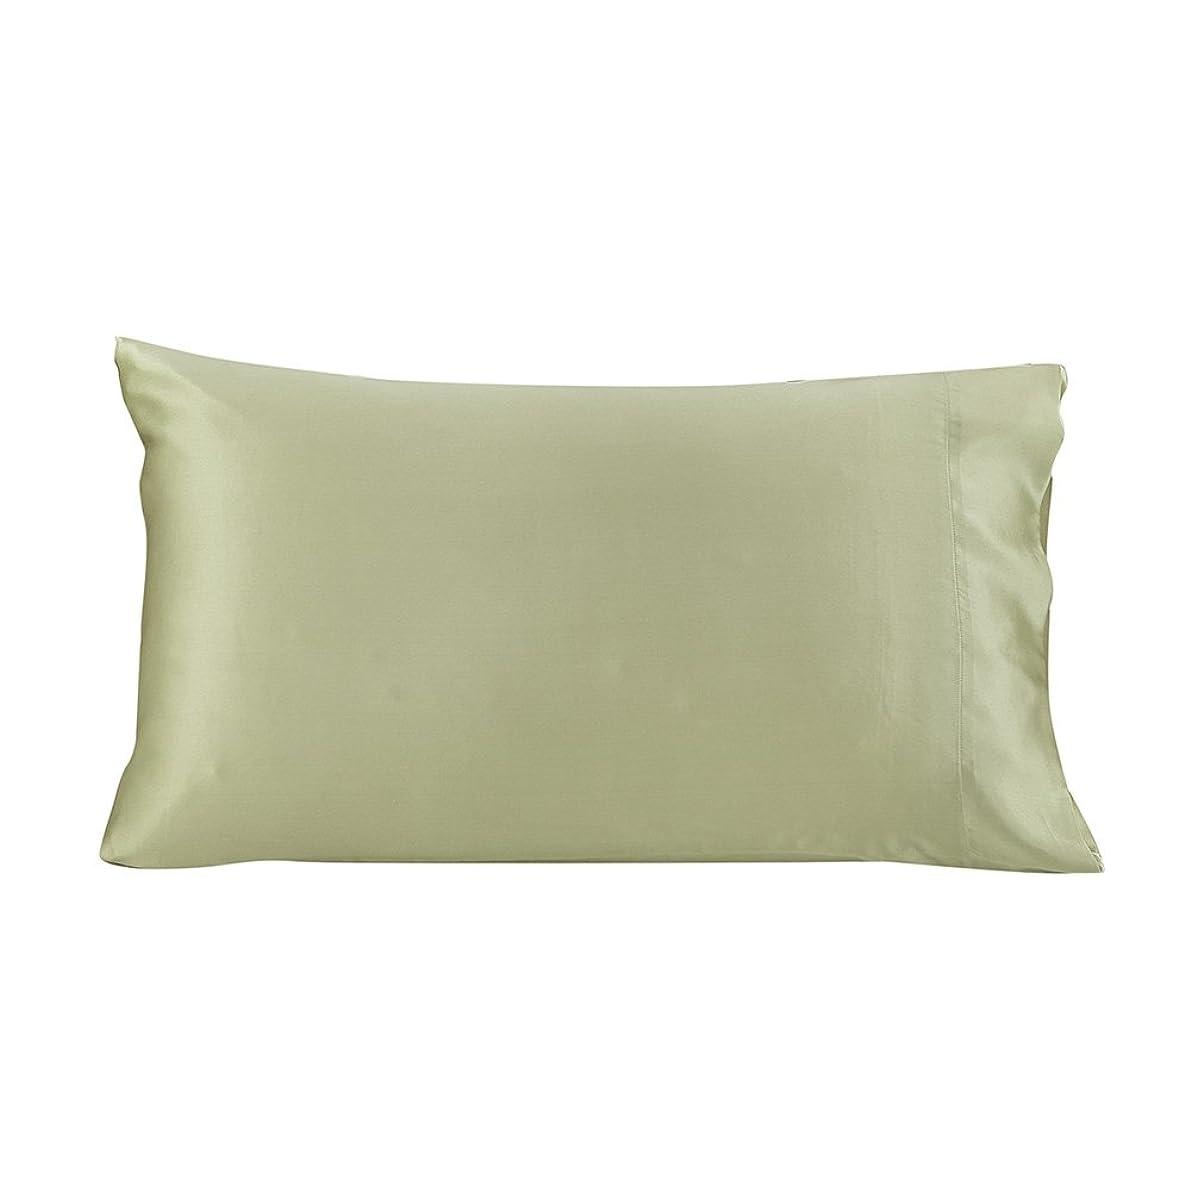 LilySilk UK1016-14-5065 100% Mulberry Silk Pillowcase Terse 22 Momme Standard 20